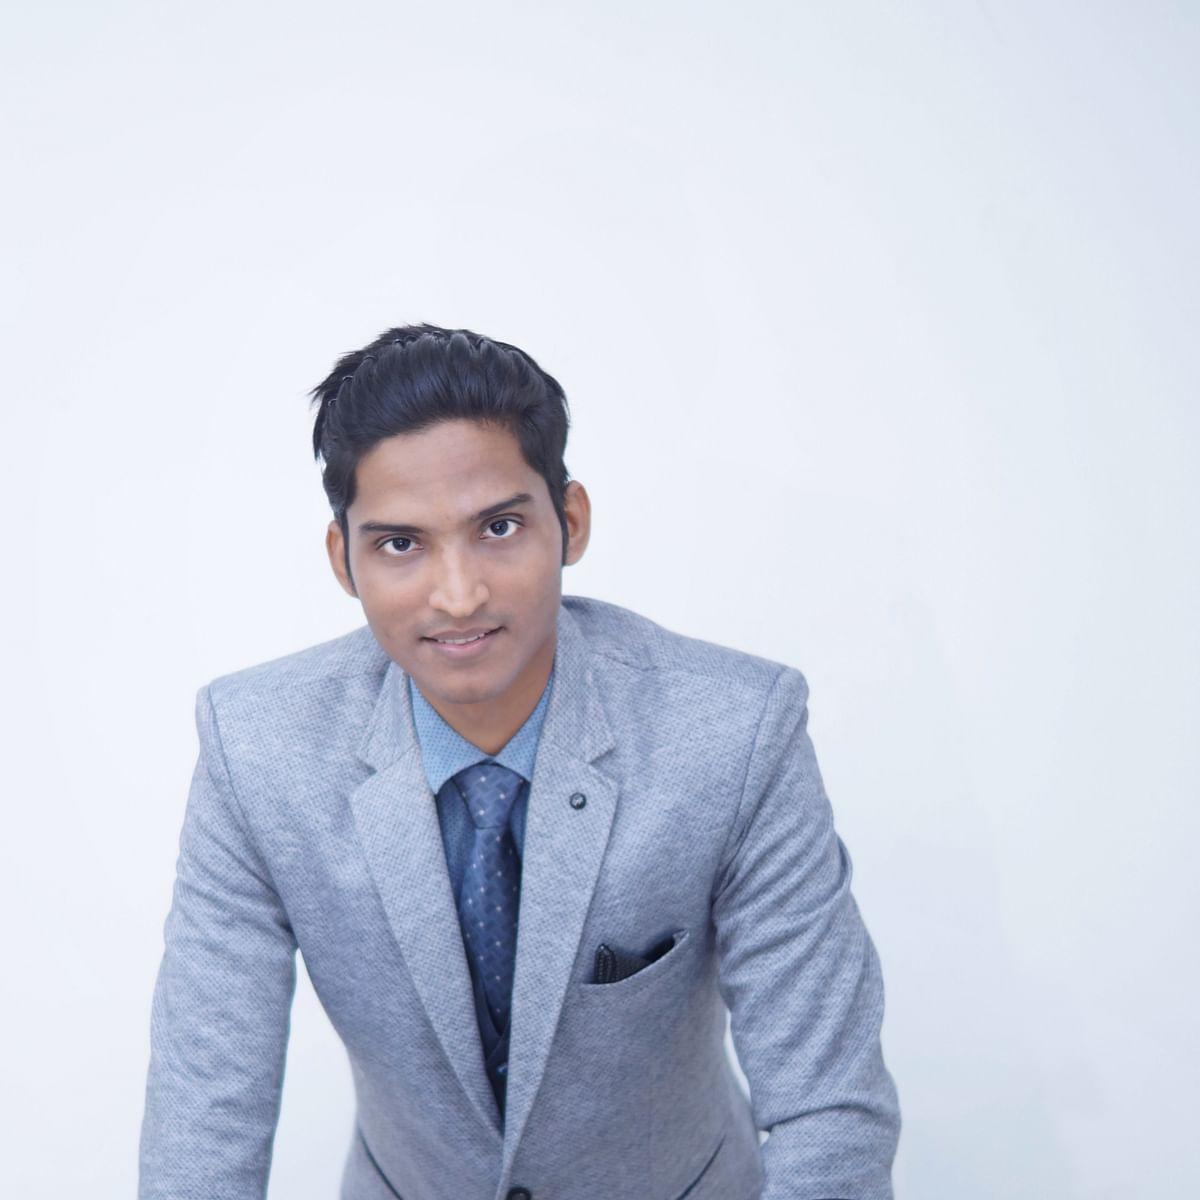 Bhopal: Ad maker plays Good Samaritan to startups